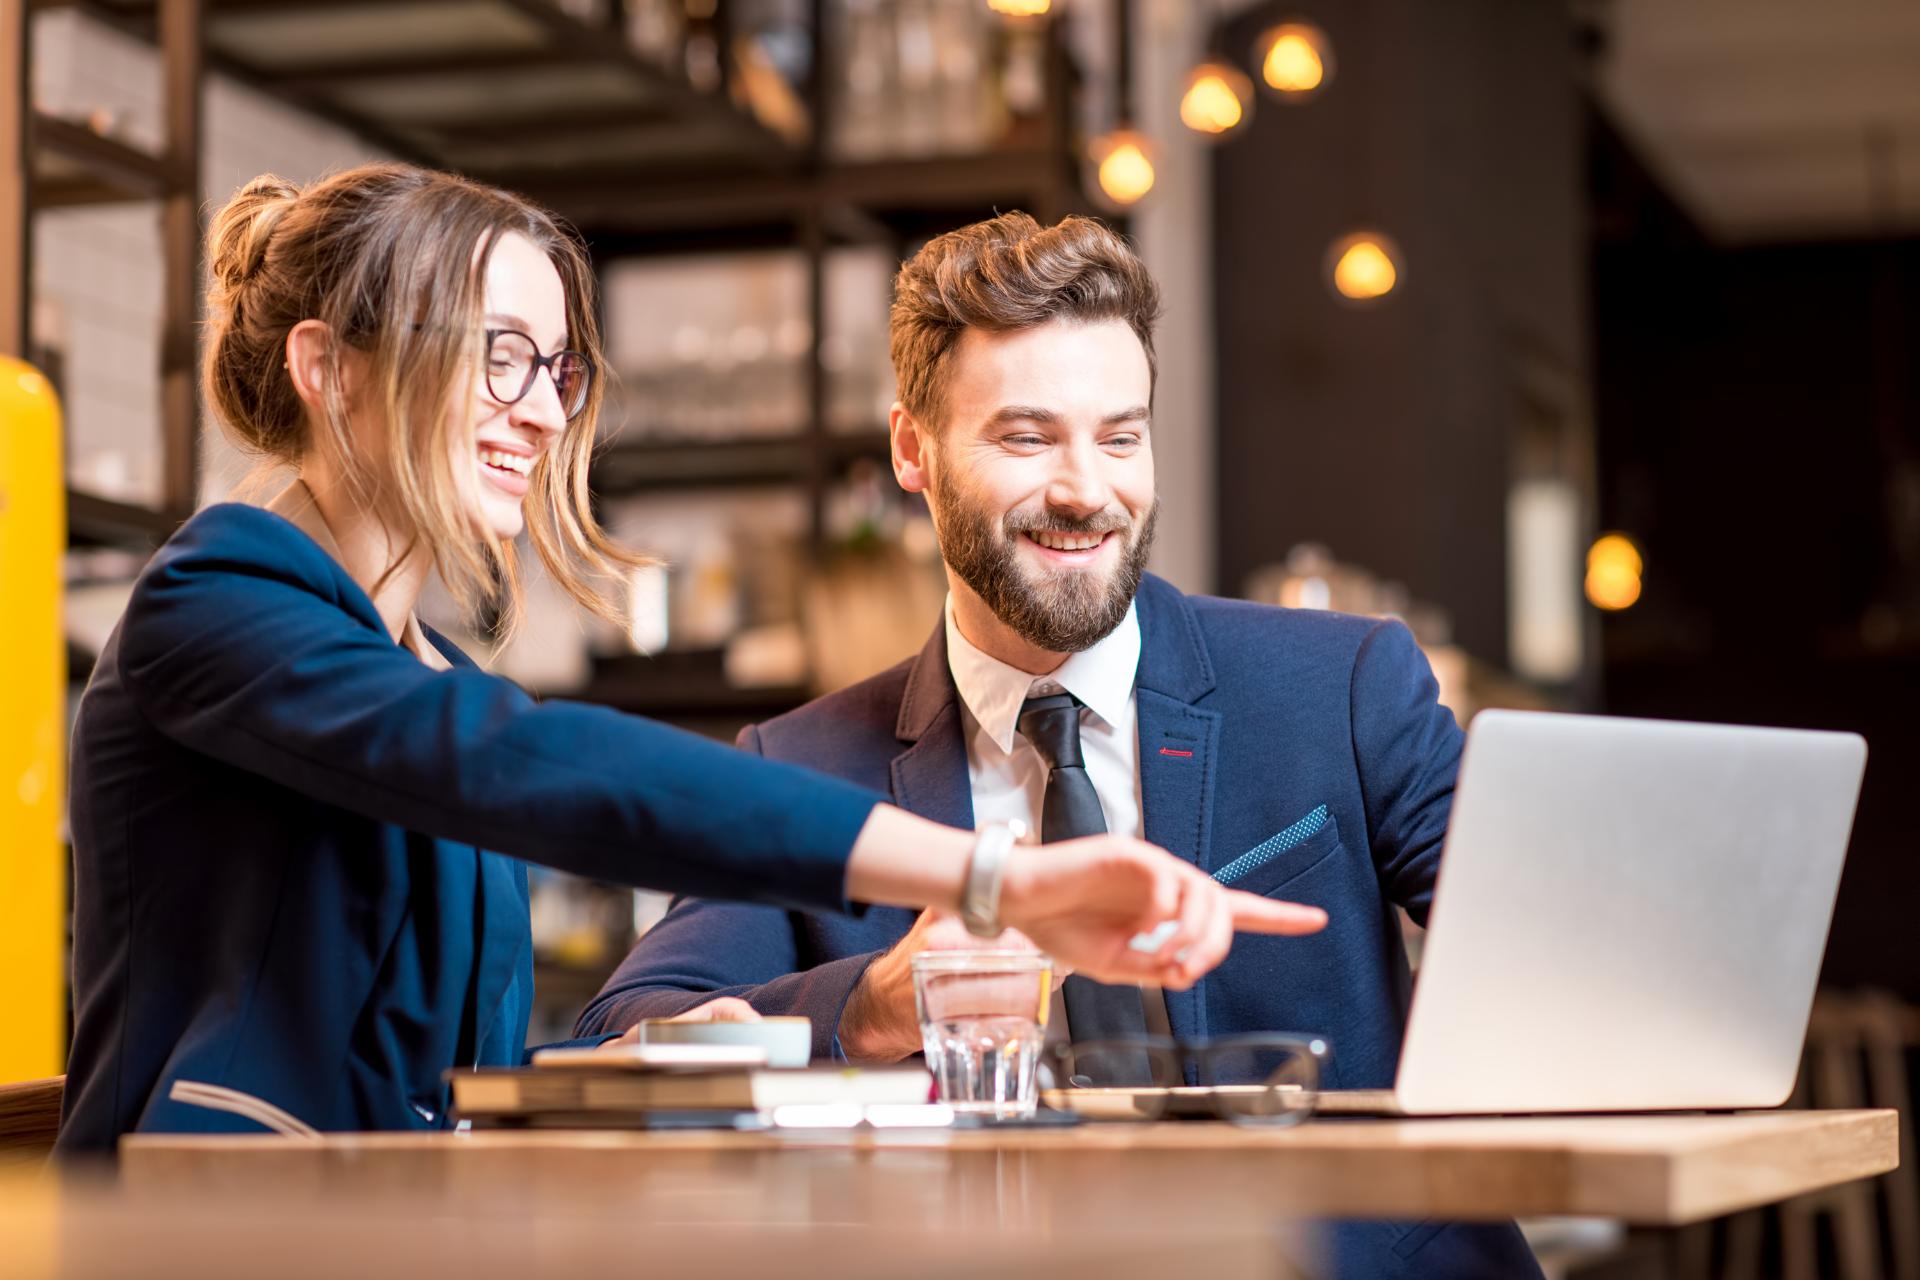 Ausloans finance aggregator marketing support 18